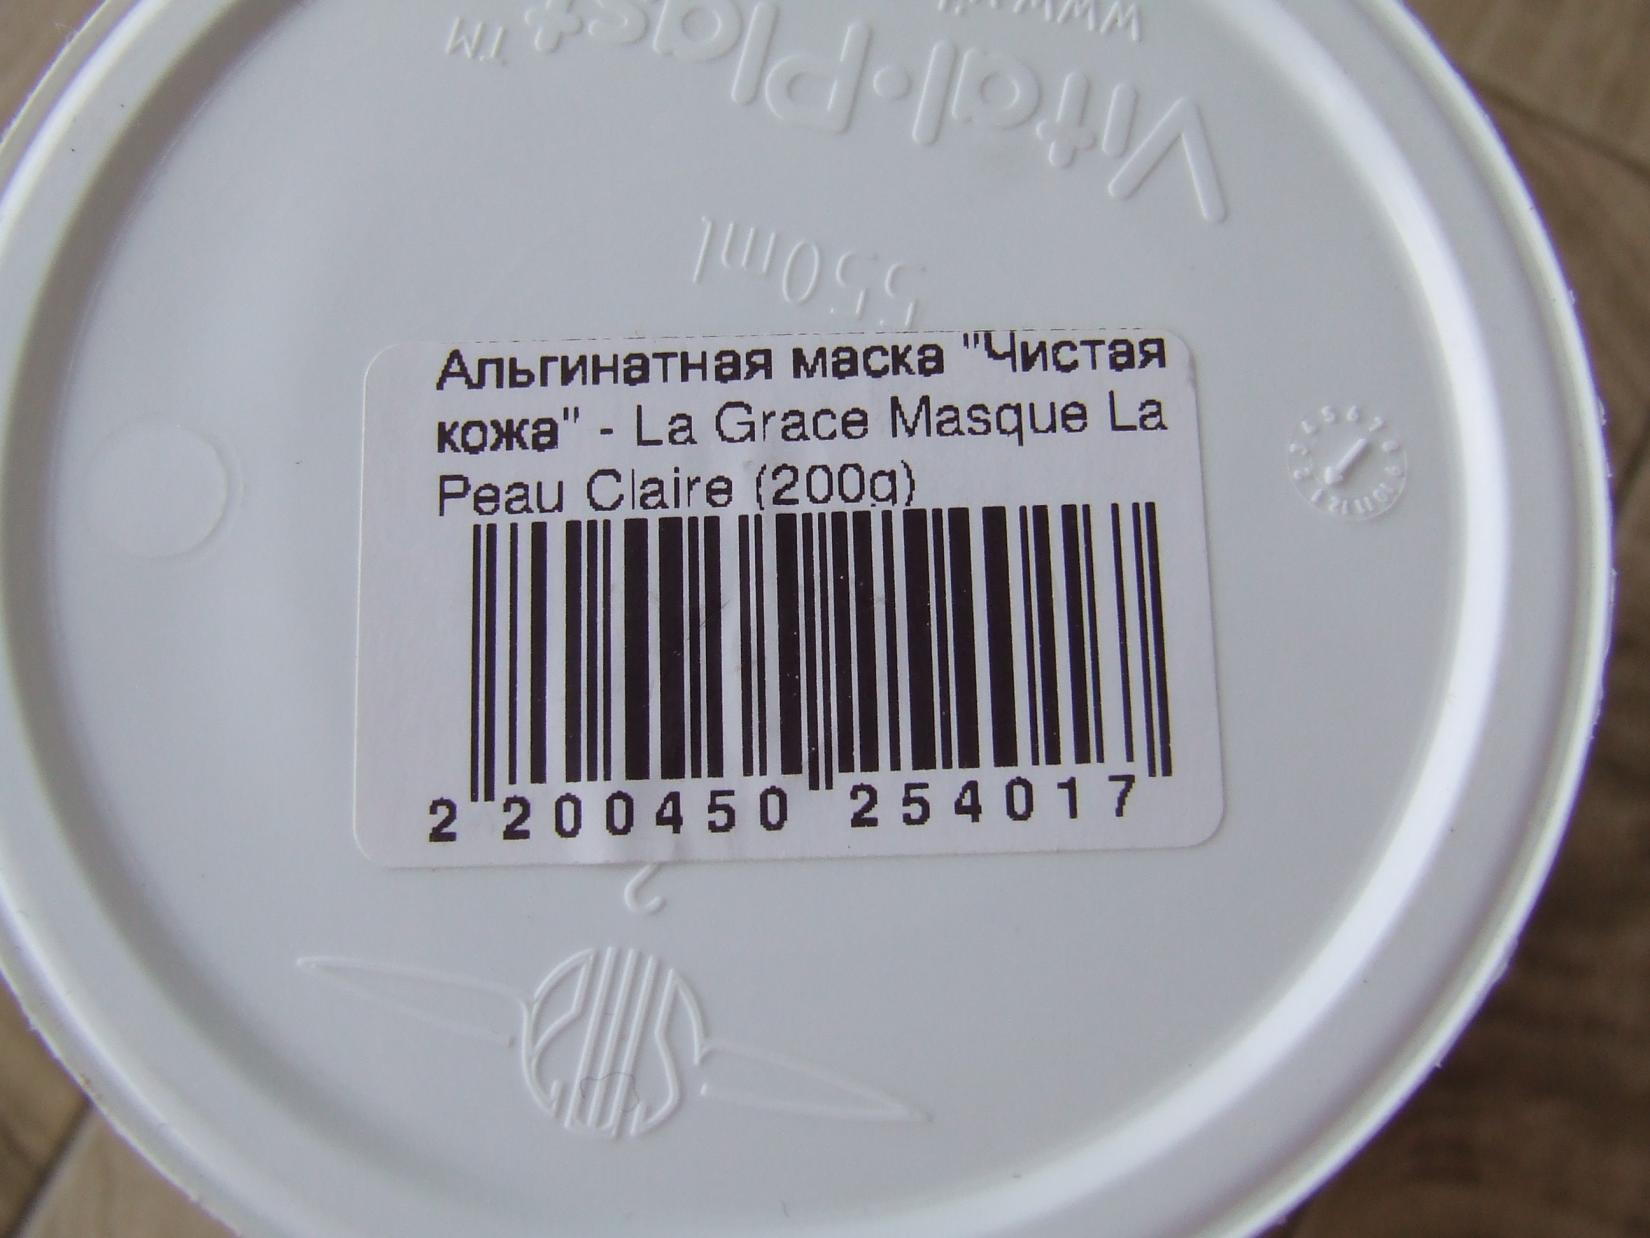 Альгинатная маска La Grace Masque La Peau Claire - штрих-код